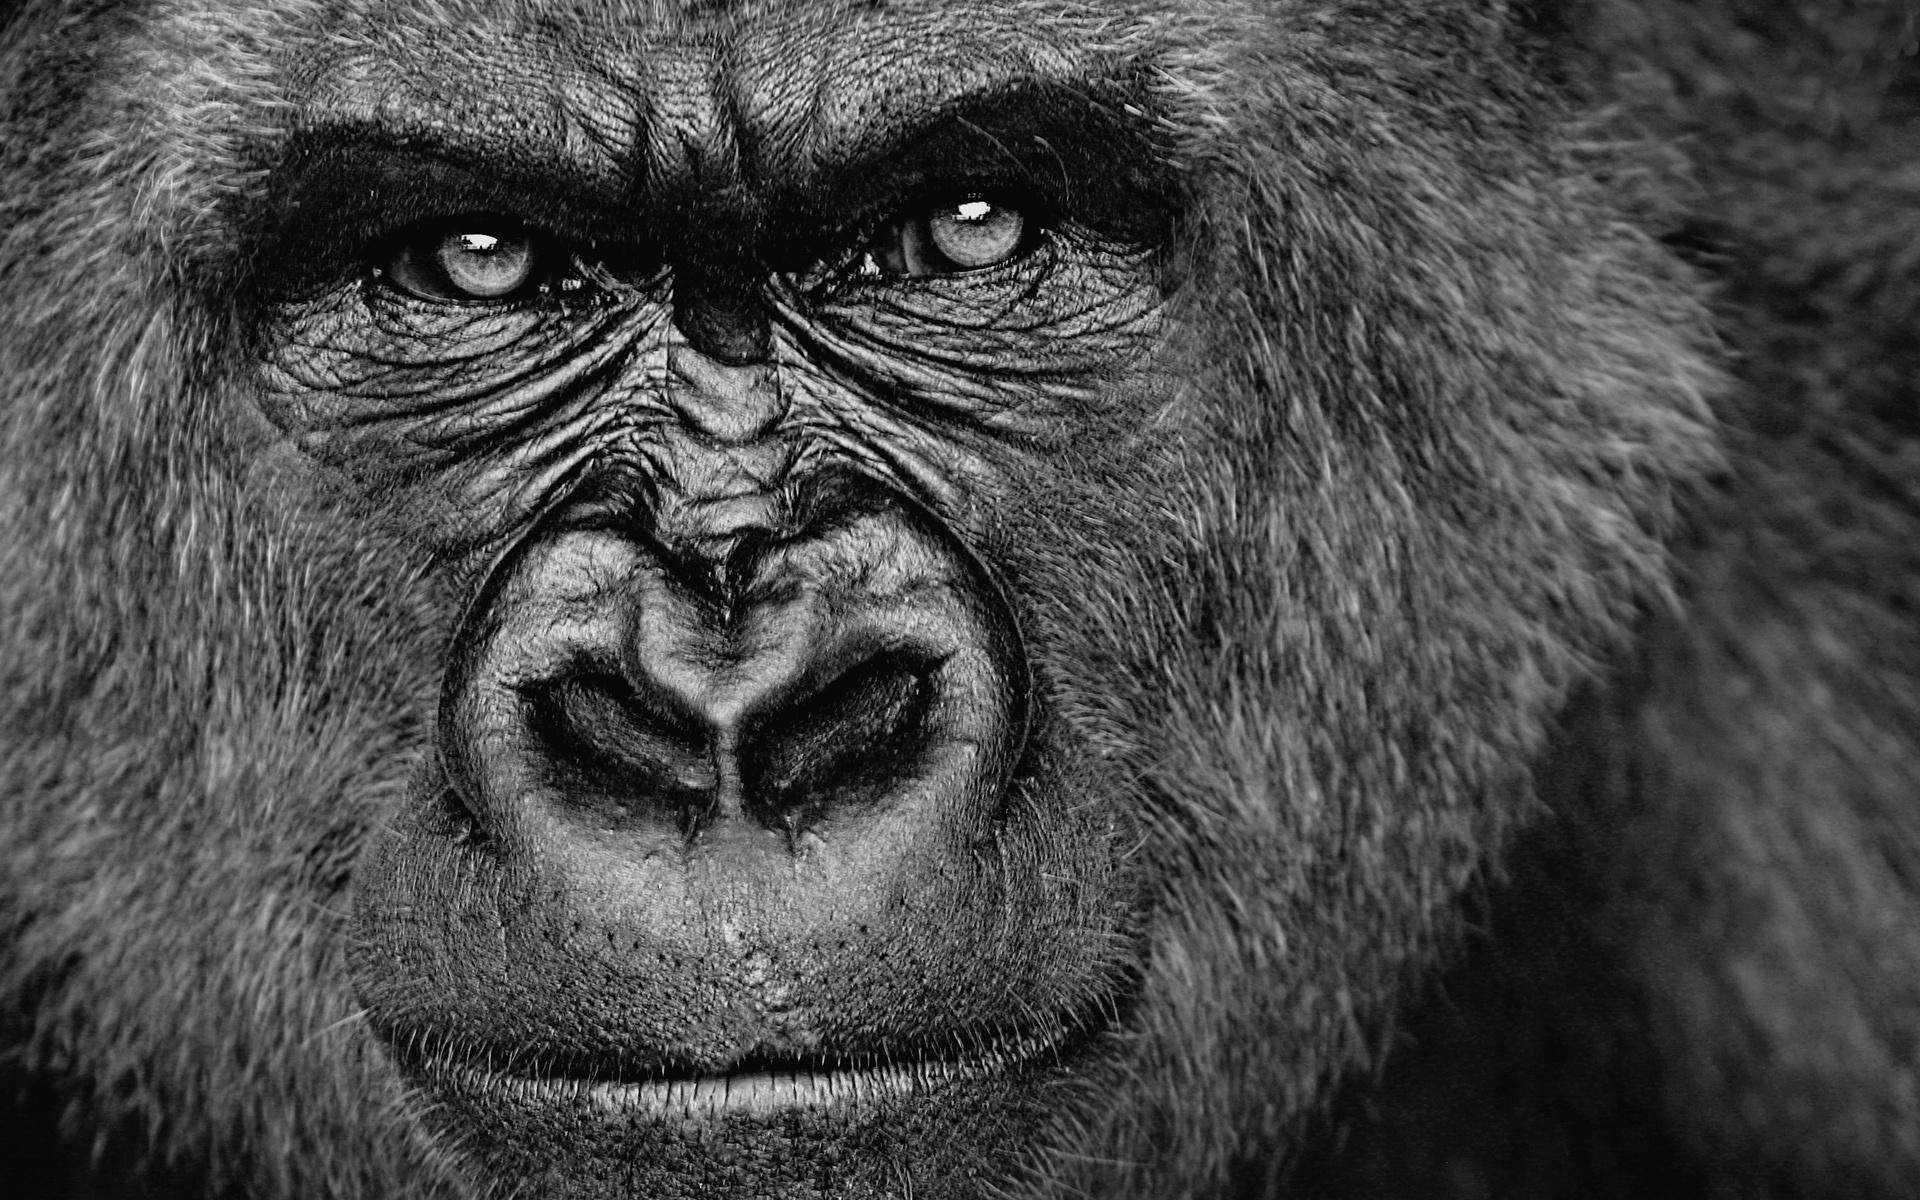 Gorilla Wallpapers, Danger Gorilla Wallpapers Pc, #20091